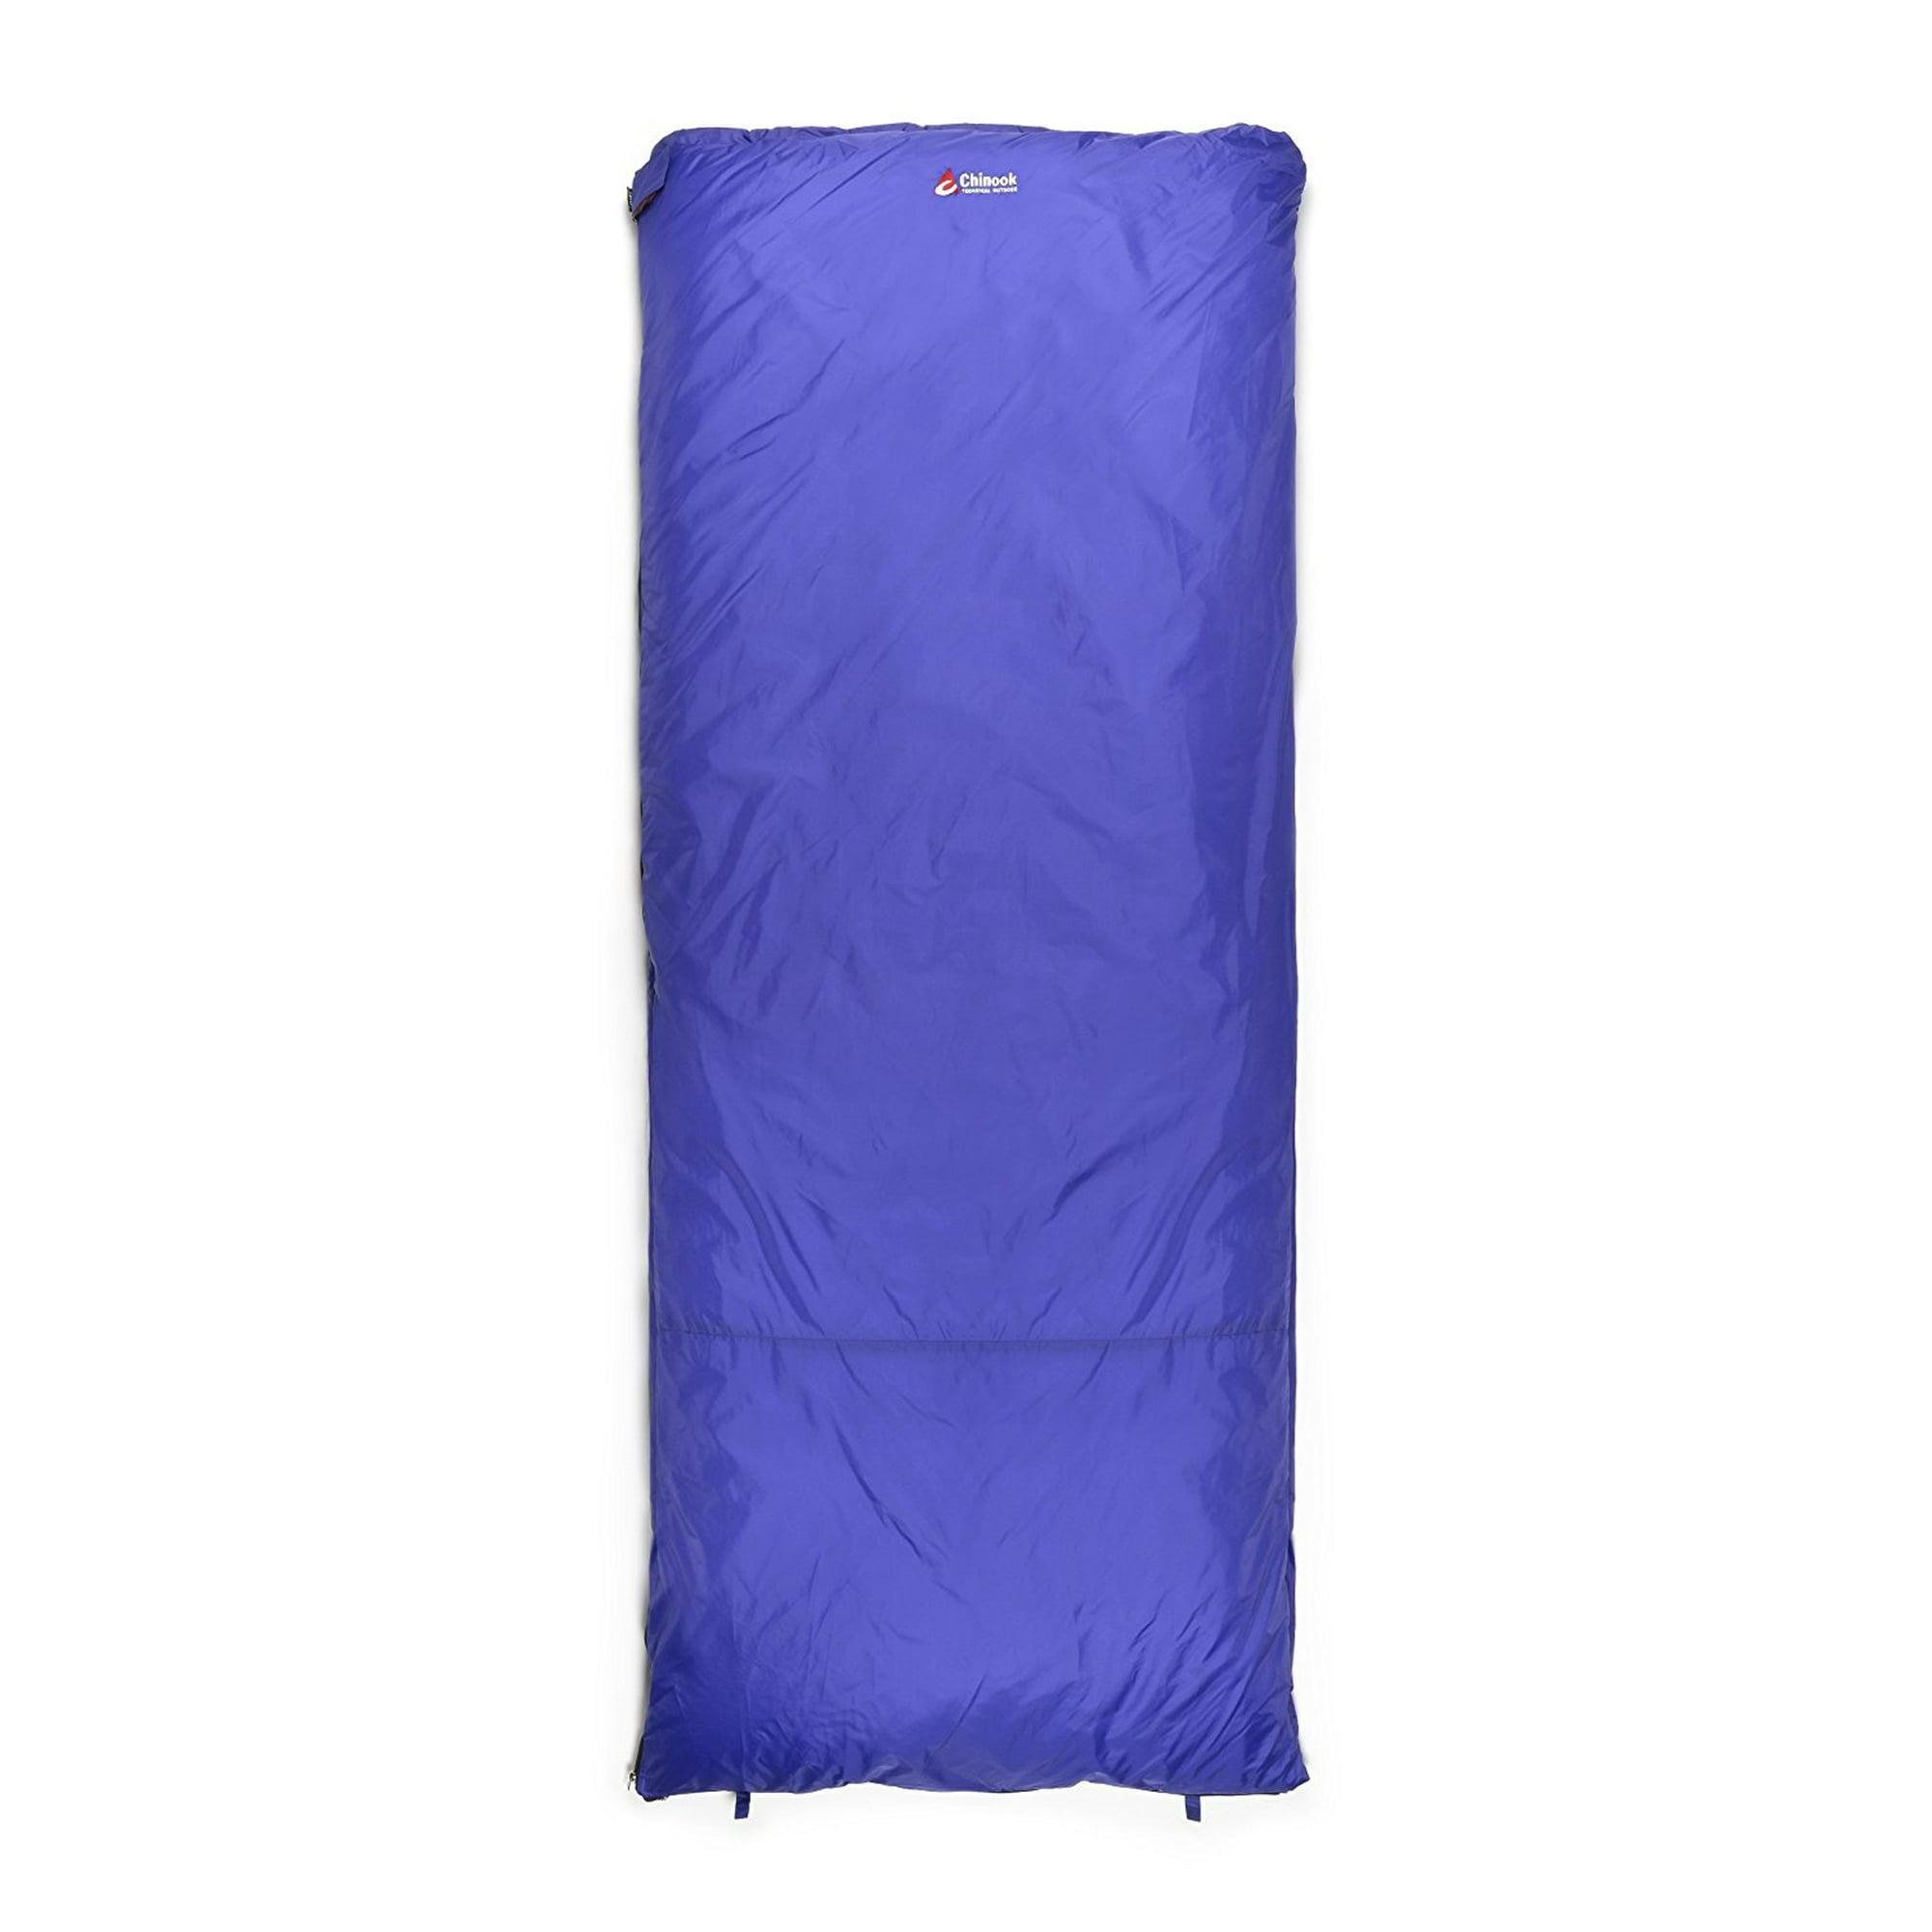 low priced 92aa1 08c5f Chinook Thermopalm Rectangle Sleeping Bag 32F/0C Blue ...